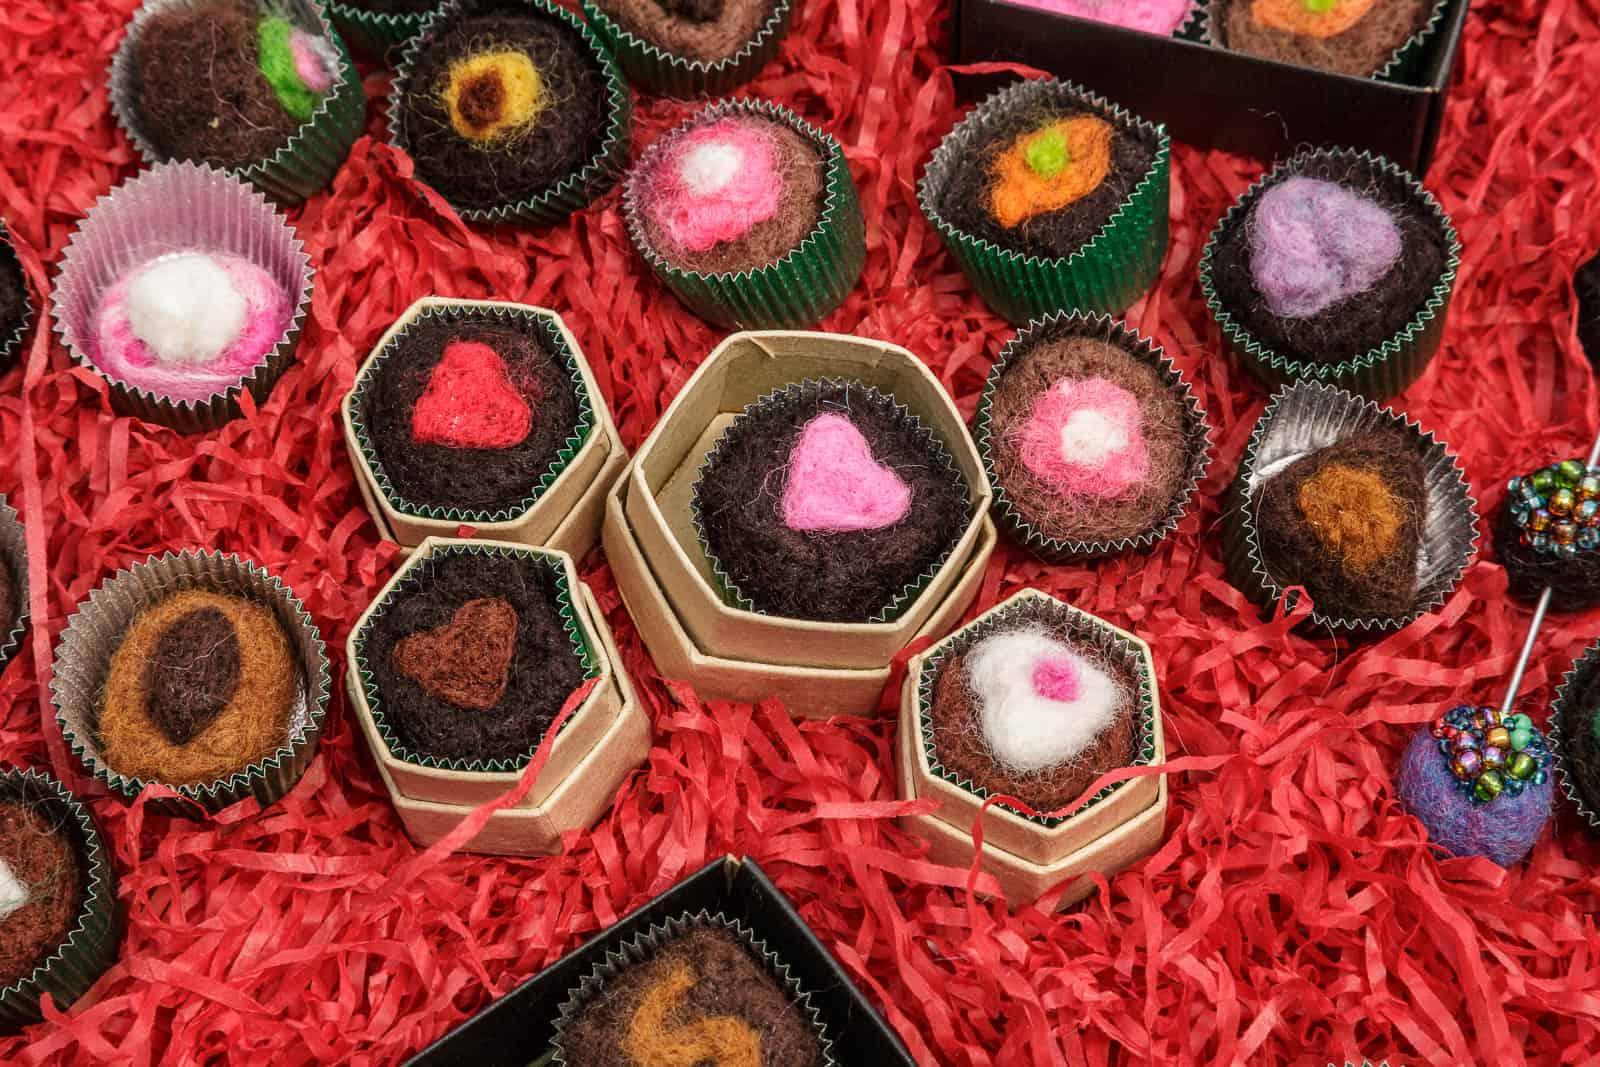 artists handmade felt chocolates in miniature product presentation box